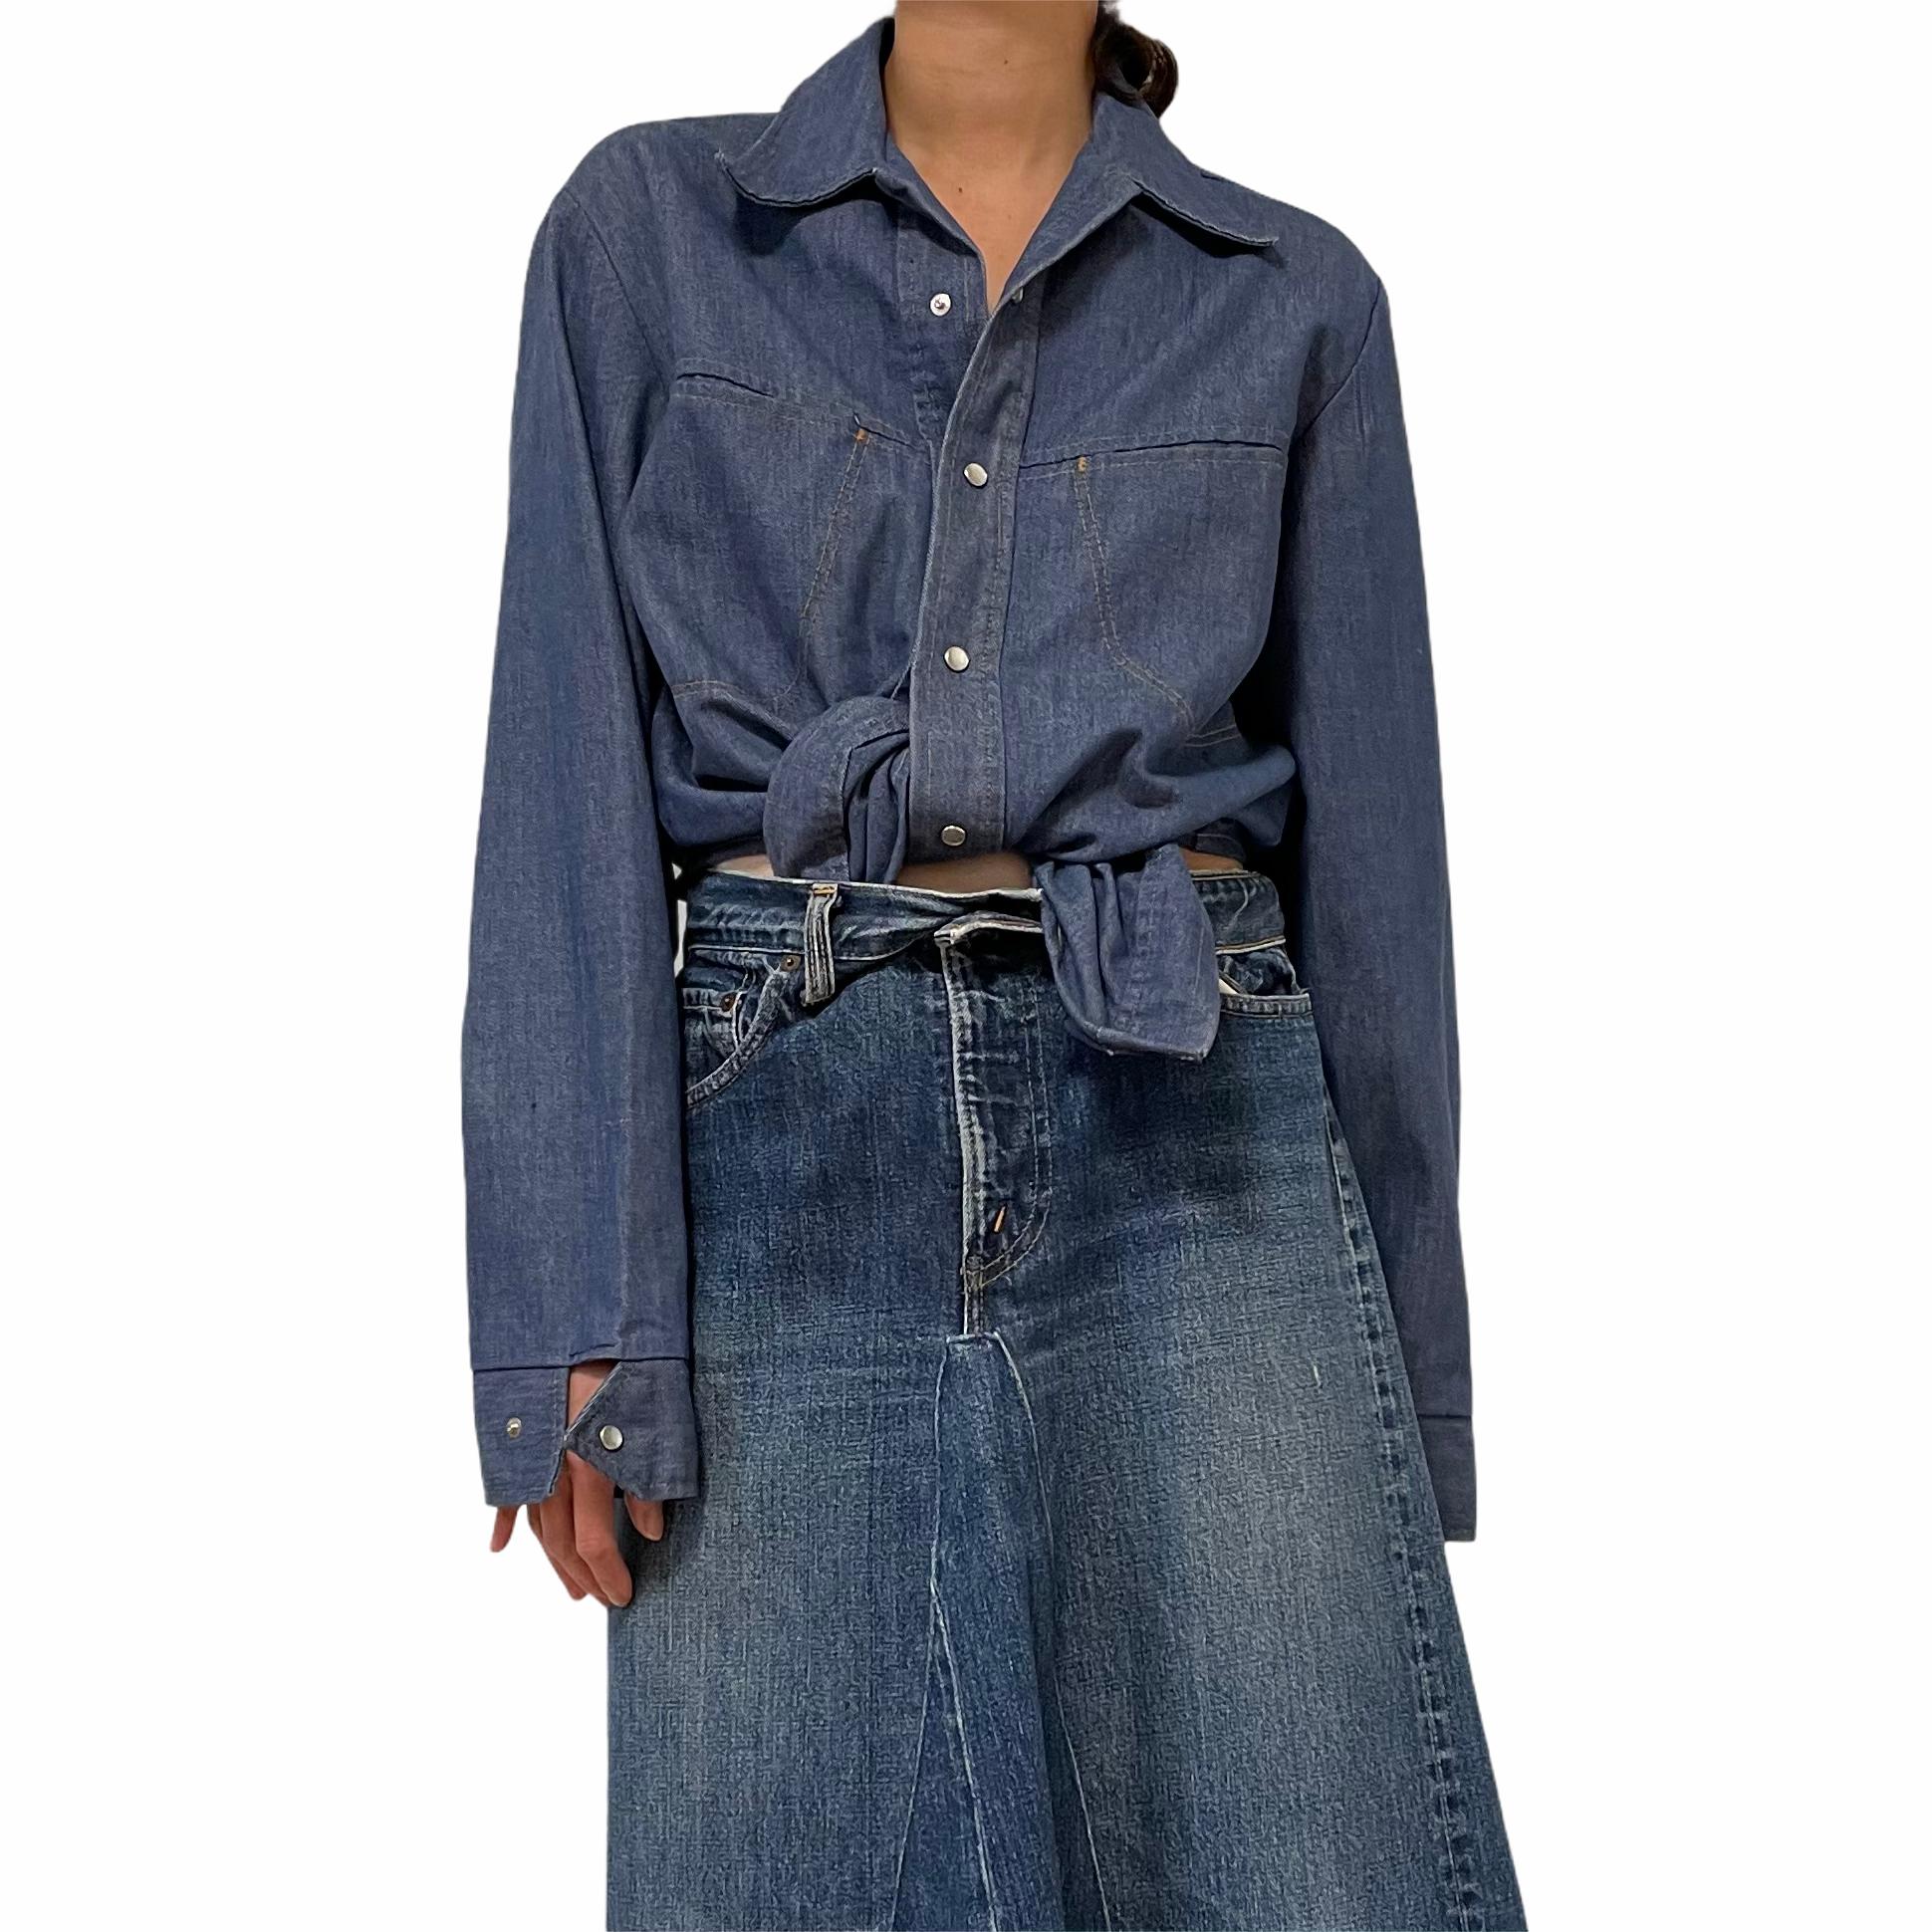 70's  TOBIAS TREND Denim Western Shirt